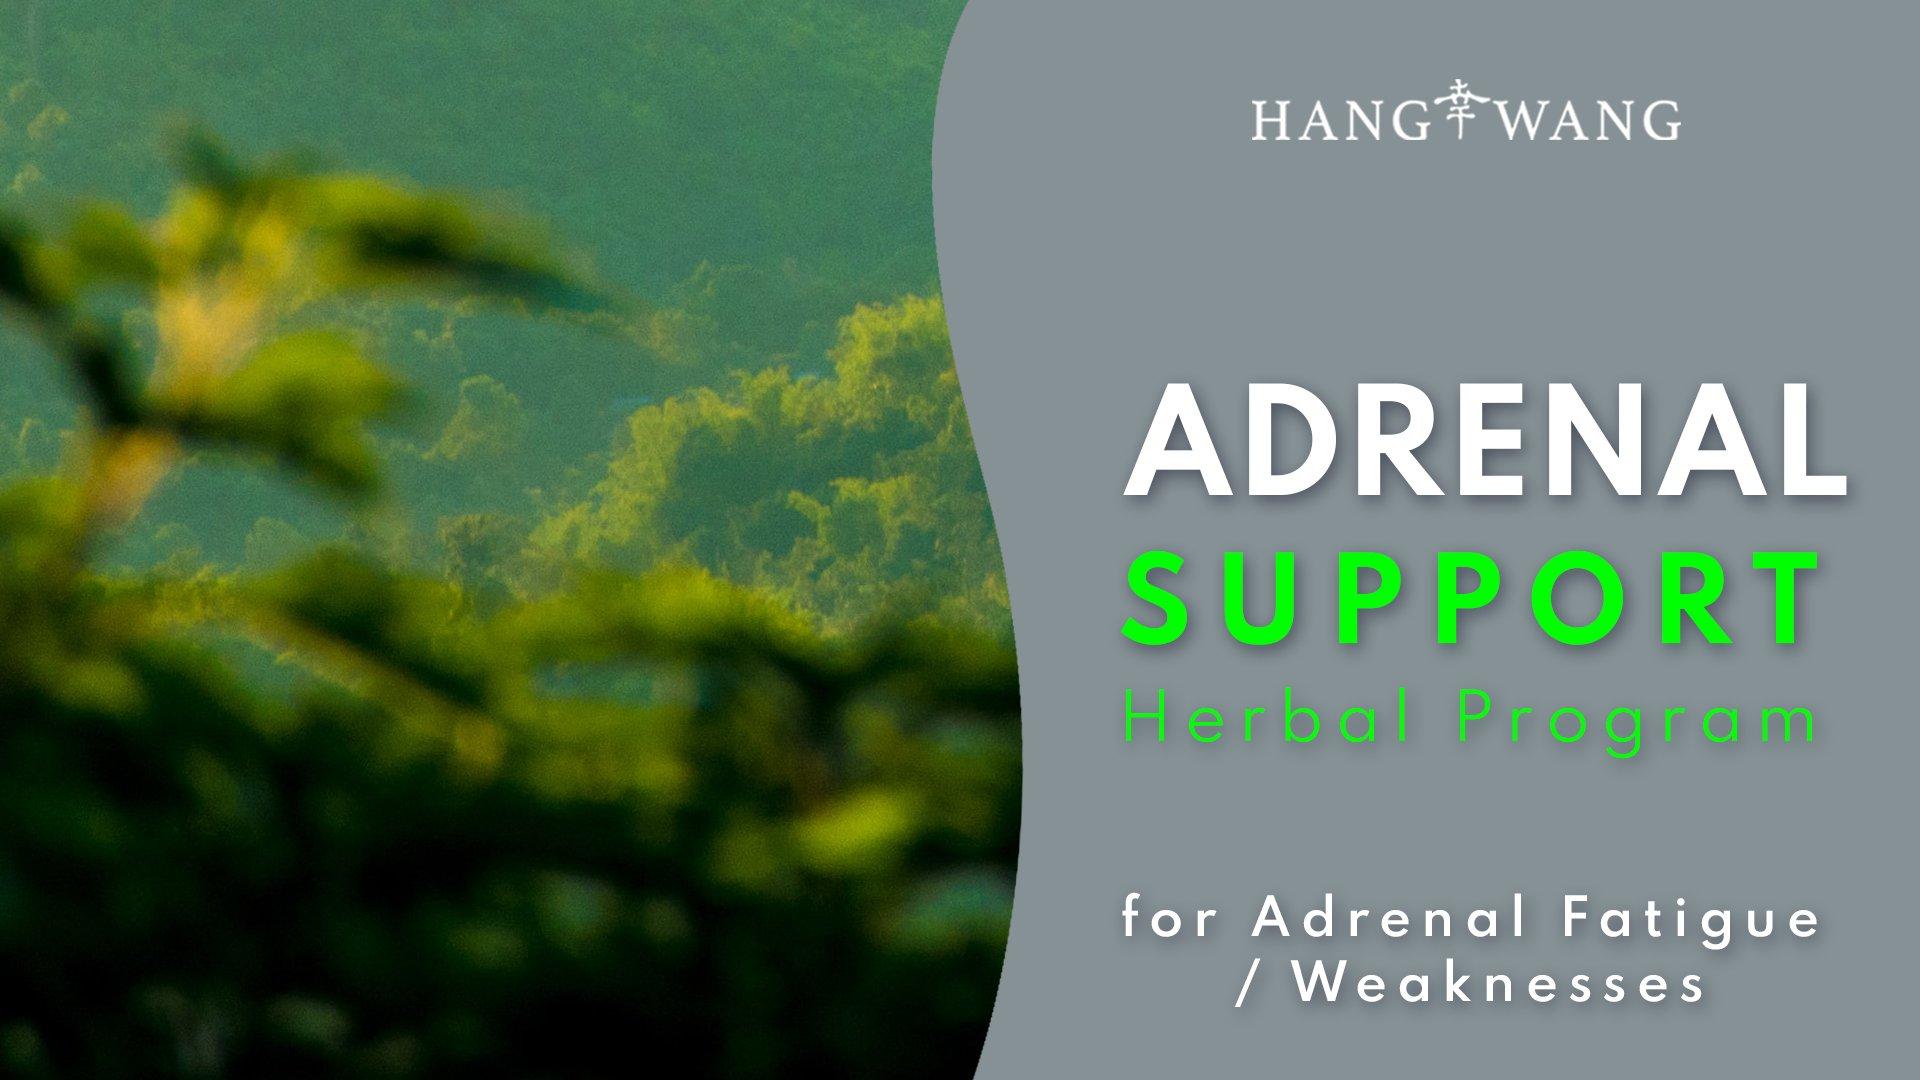 Adrenal Support Herbal Program